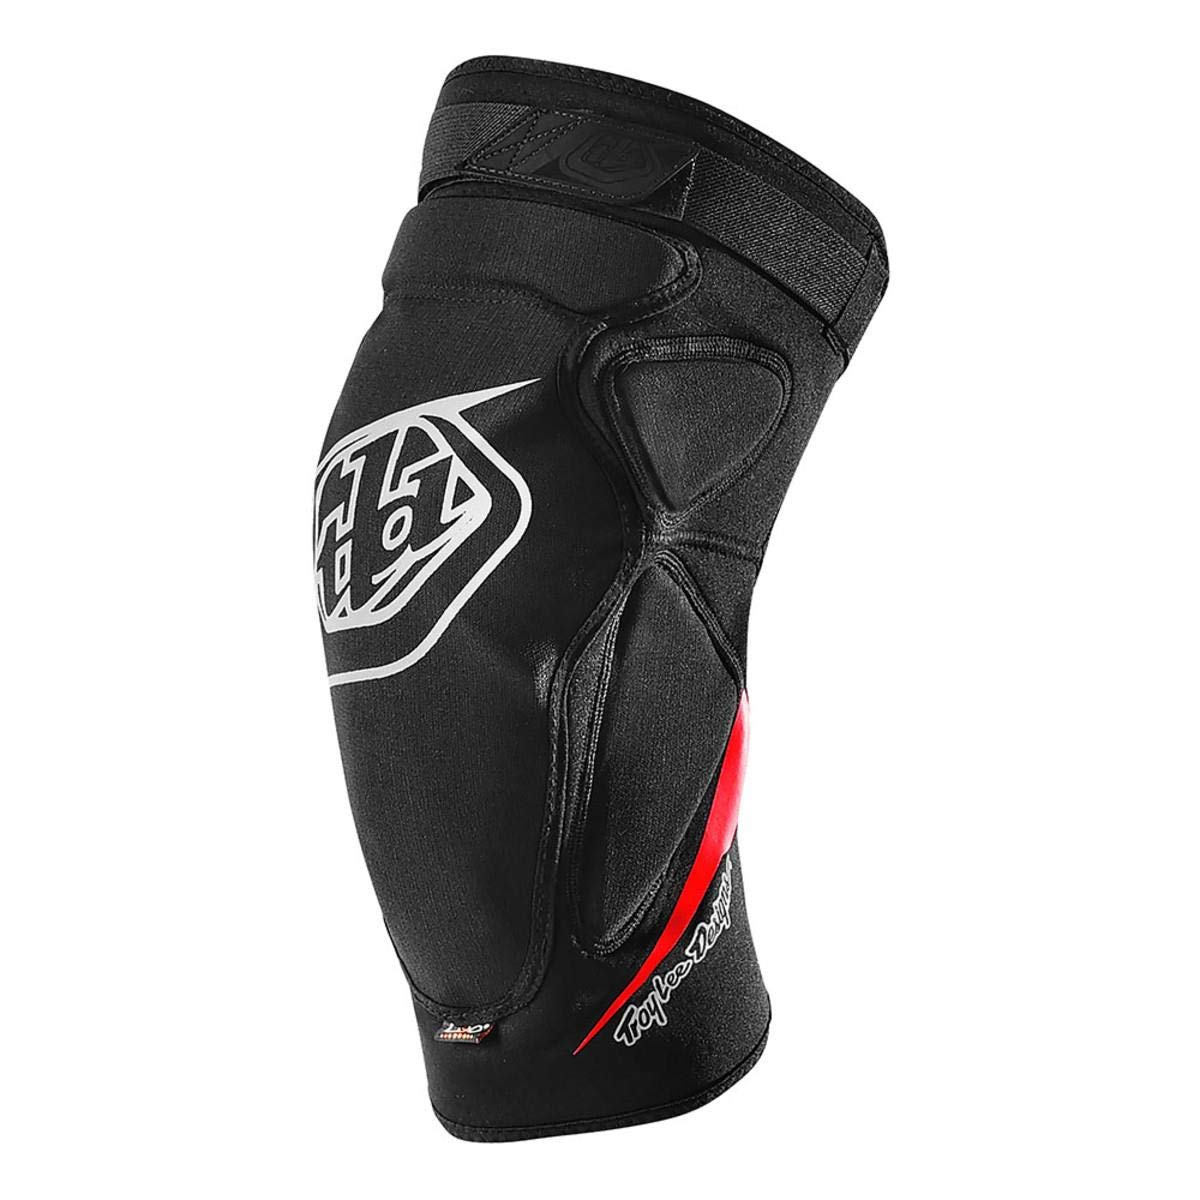 Troy Lee Designs Raid Knee Guard Solid Black XS-S